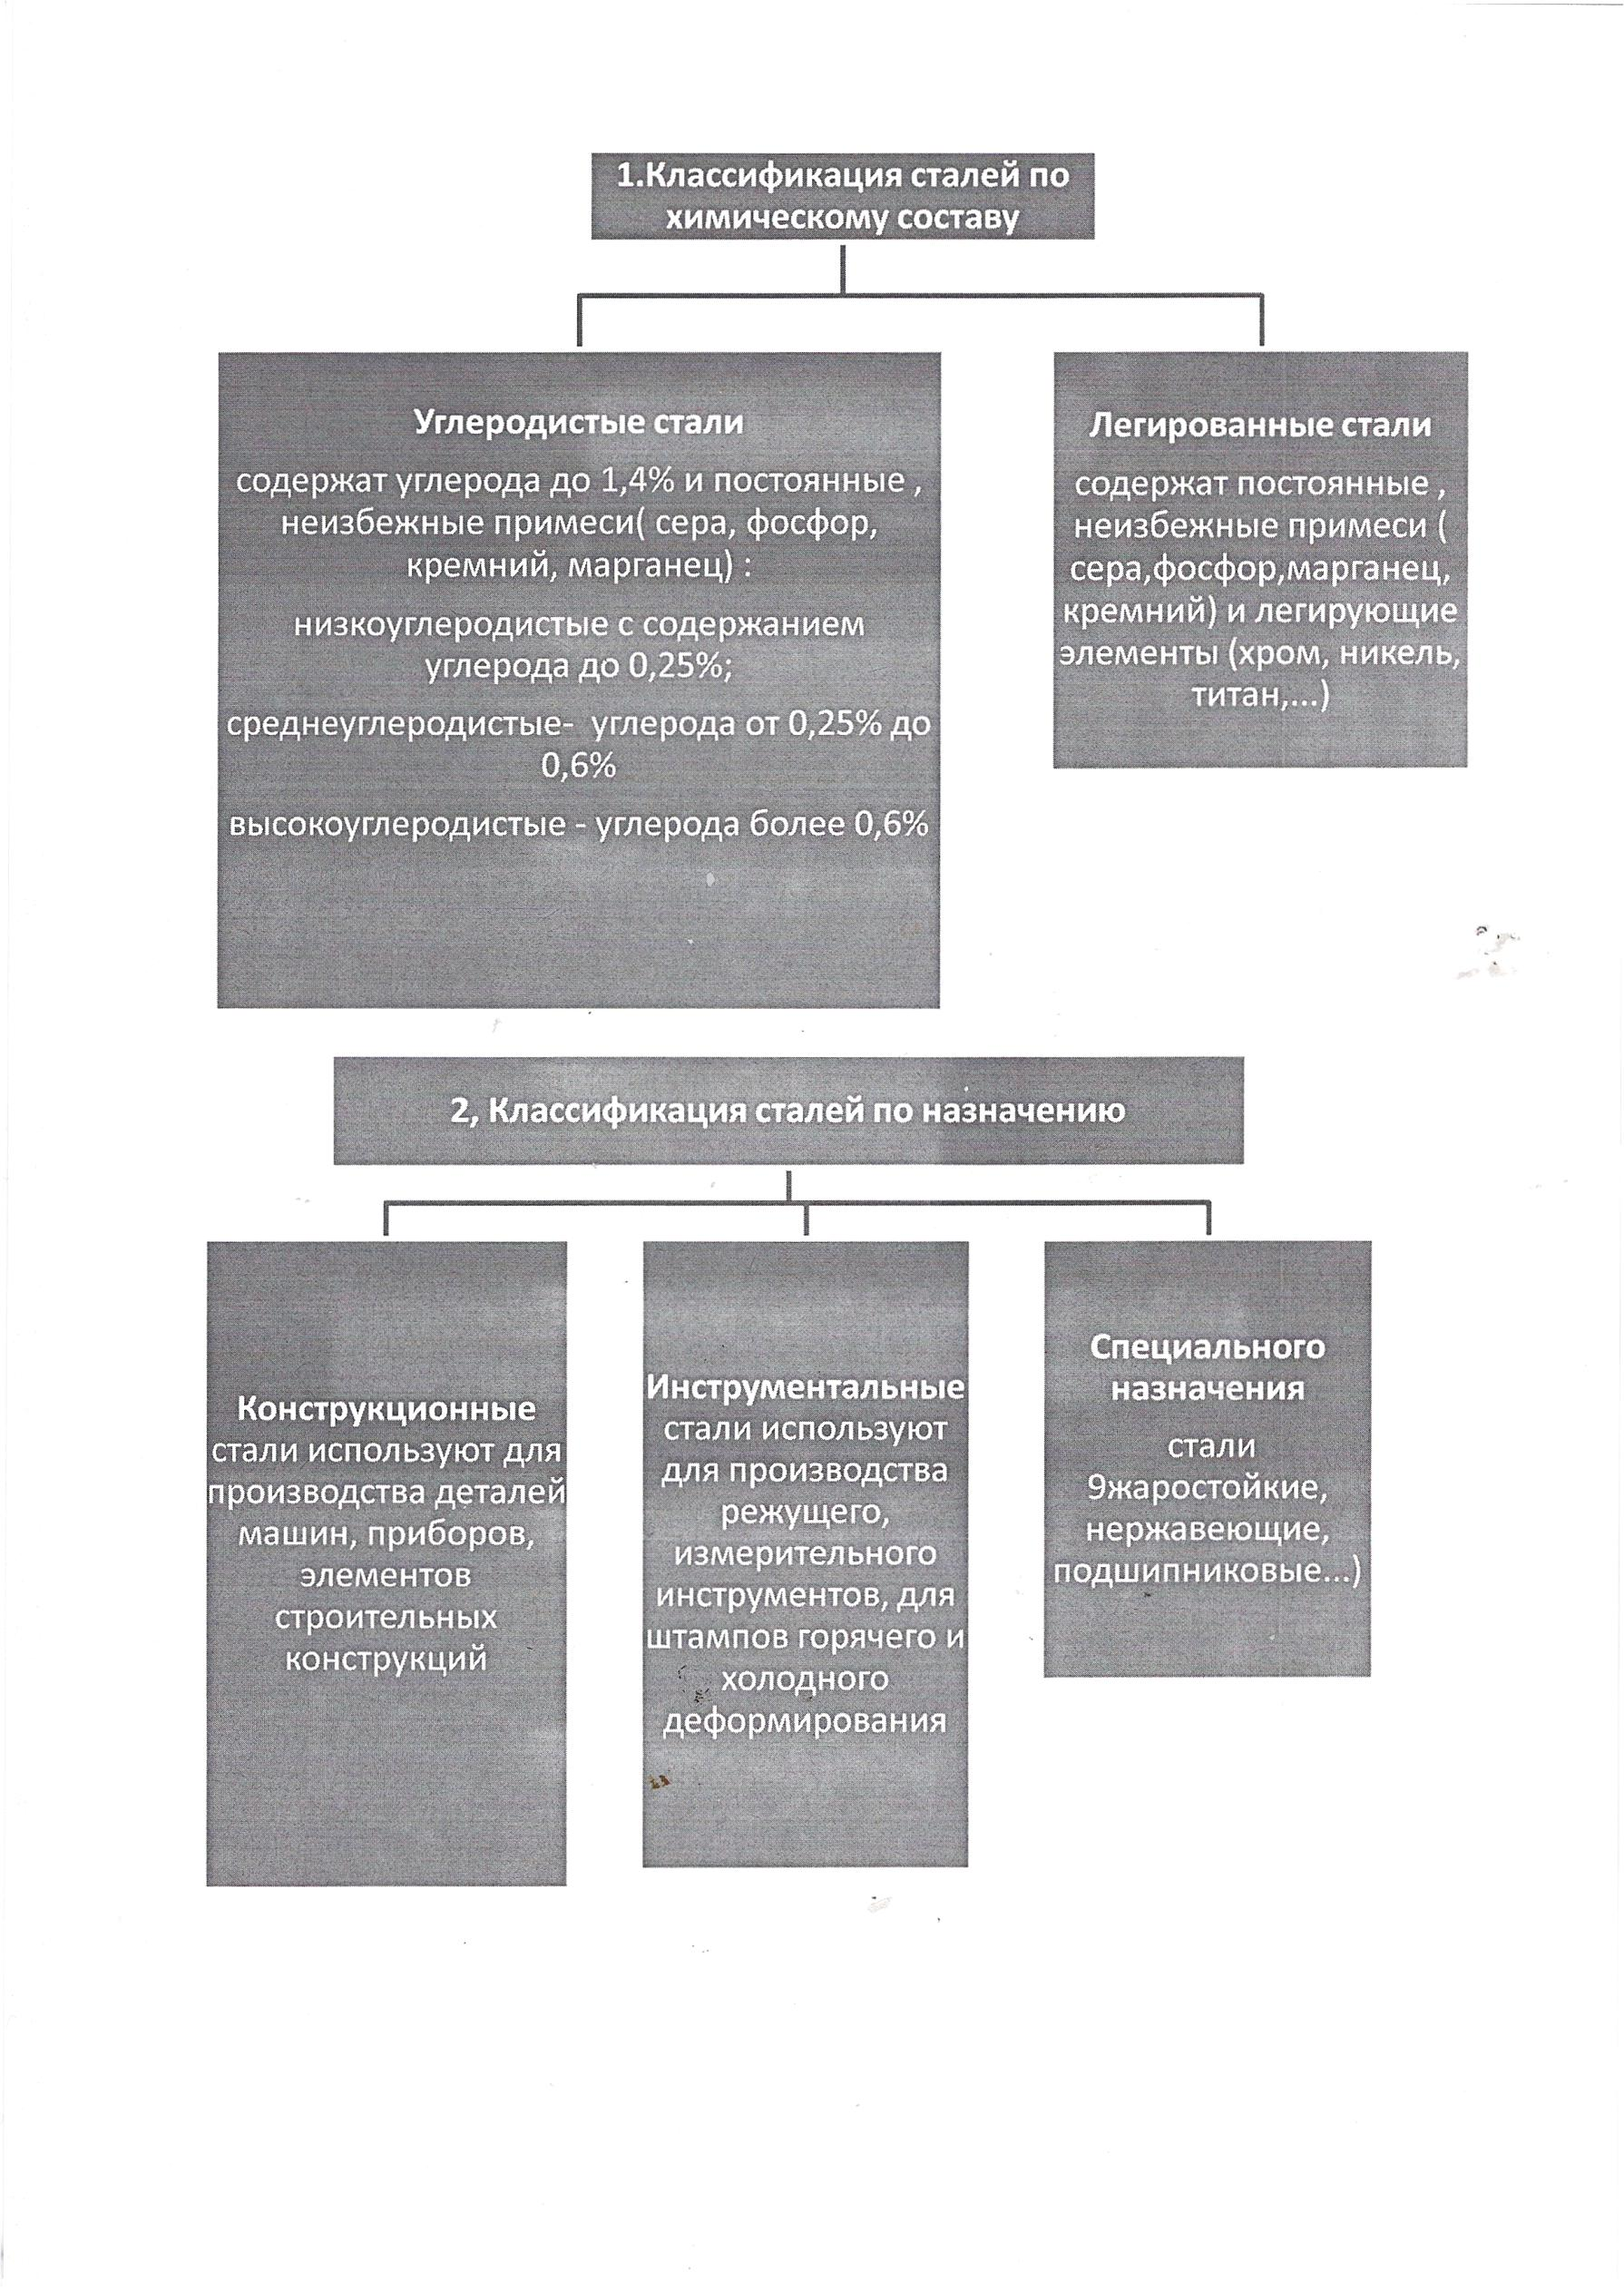 F:\Аттестация\Урок Классификация сталей\1,2.tif